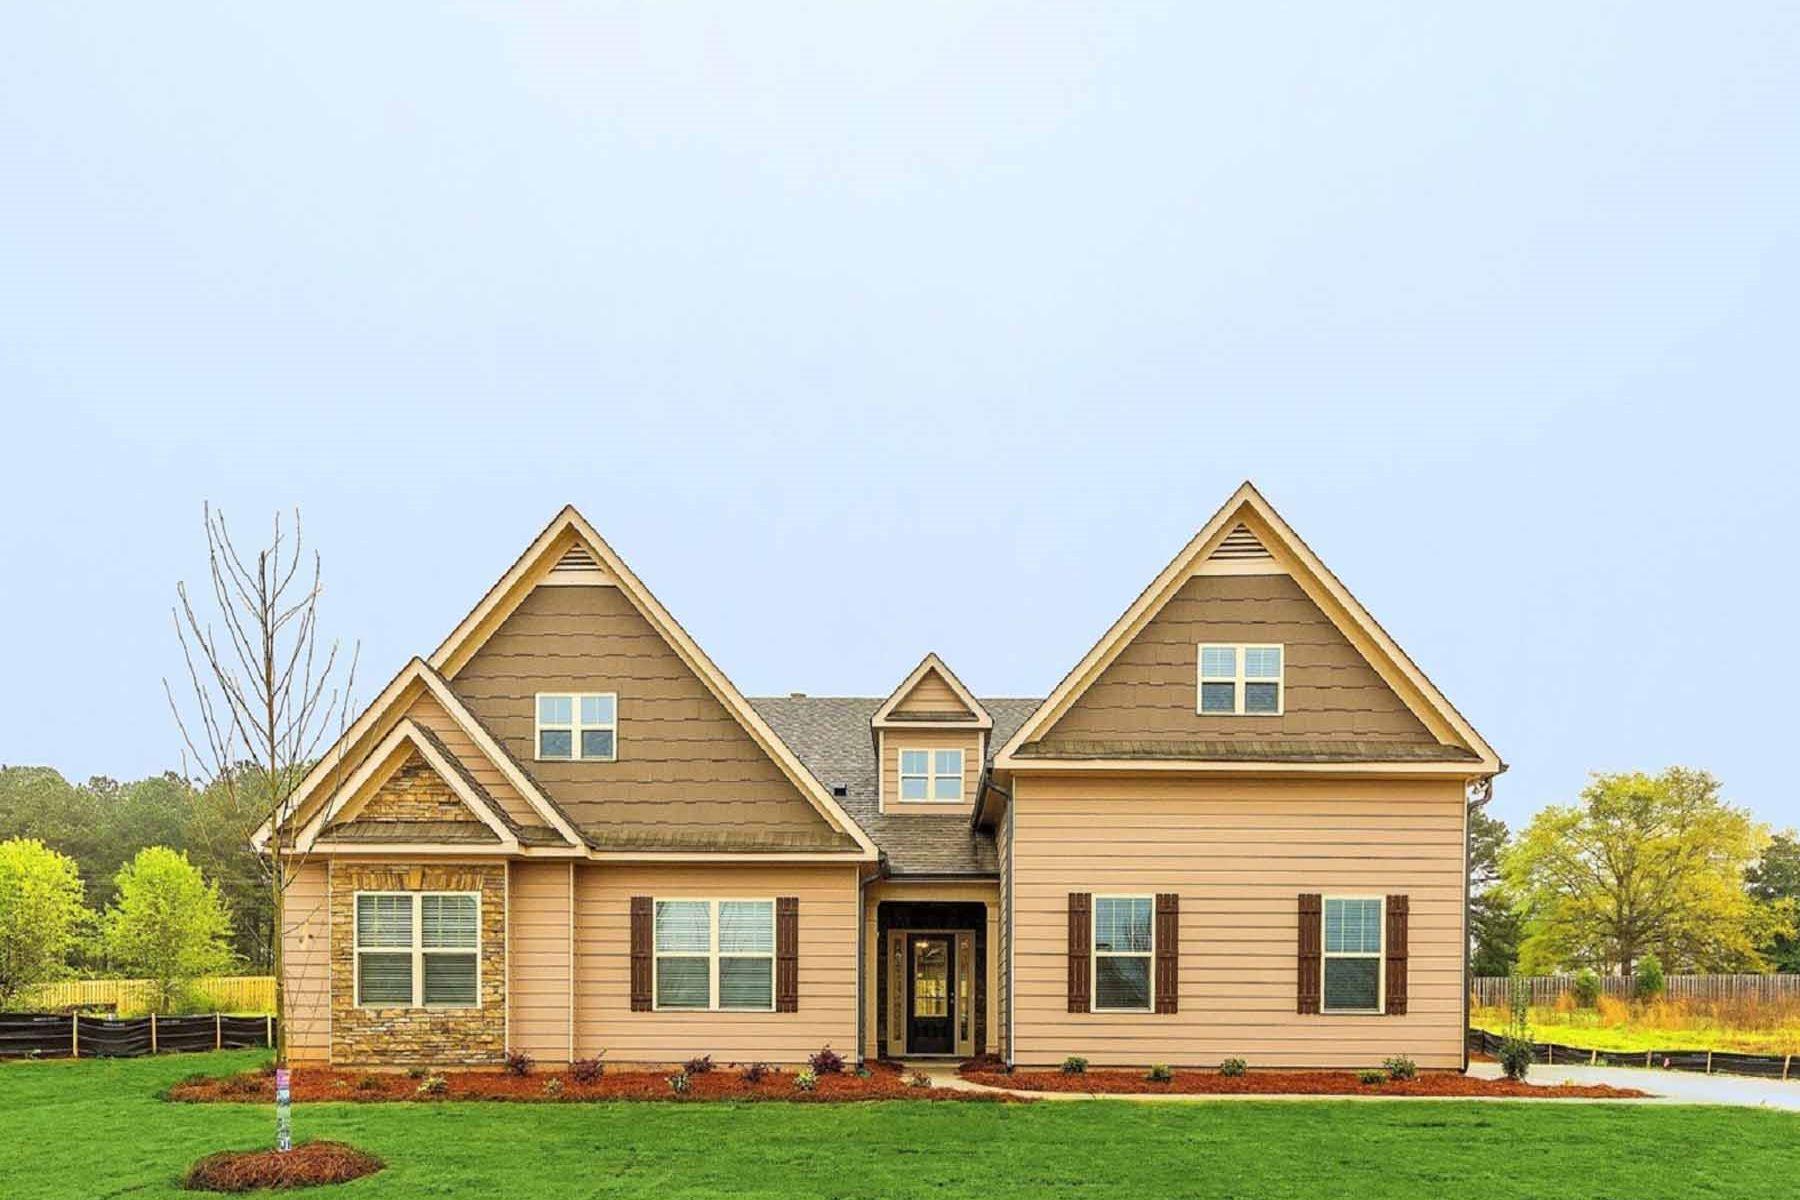 獨棟家庭住宅 為 出售 在 New Constriction Ranch On A Full Basement 210 Wilde Oak Court Canton, 喬治亞州, 30115 美國